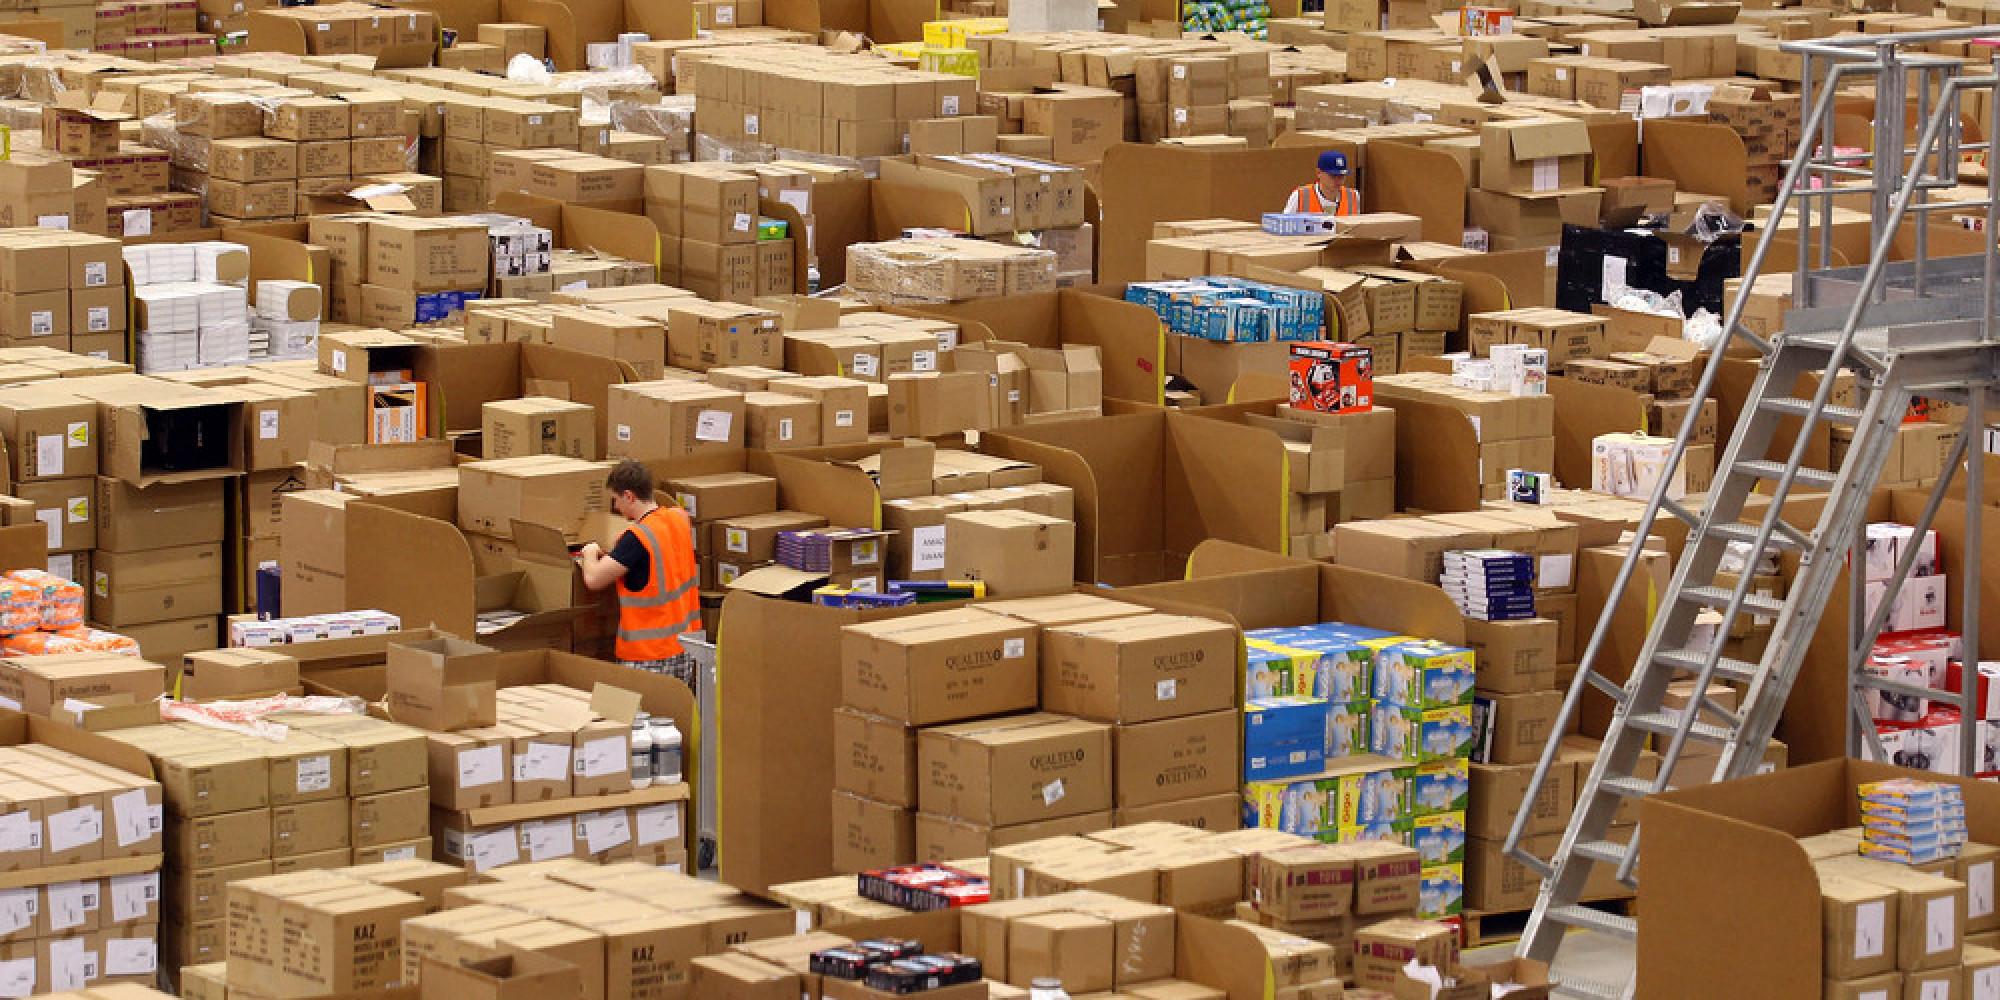 Overstocked warehouse